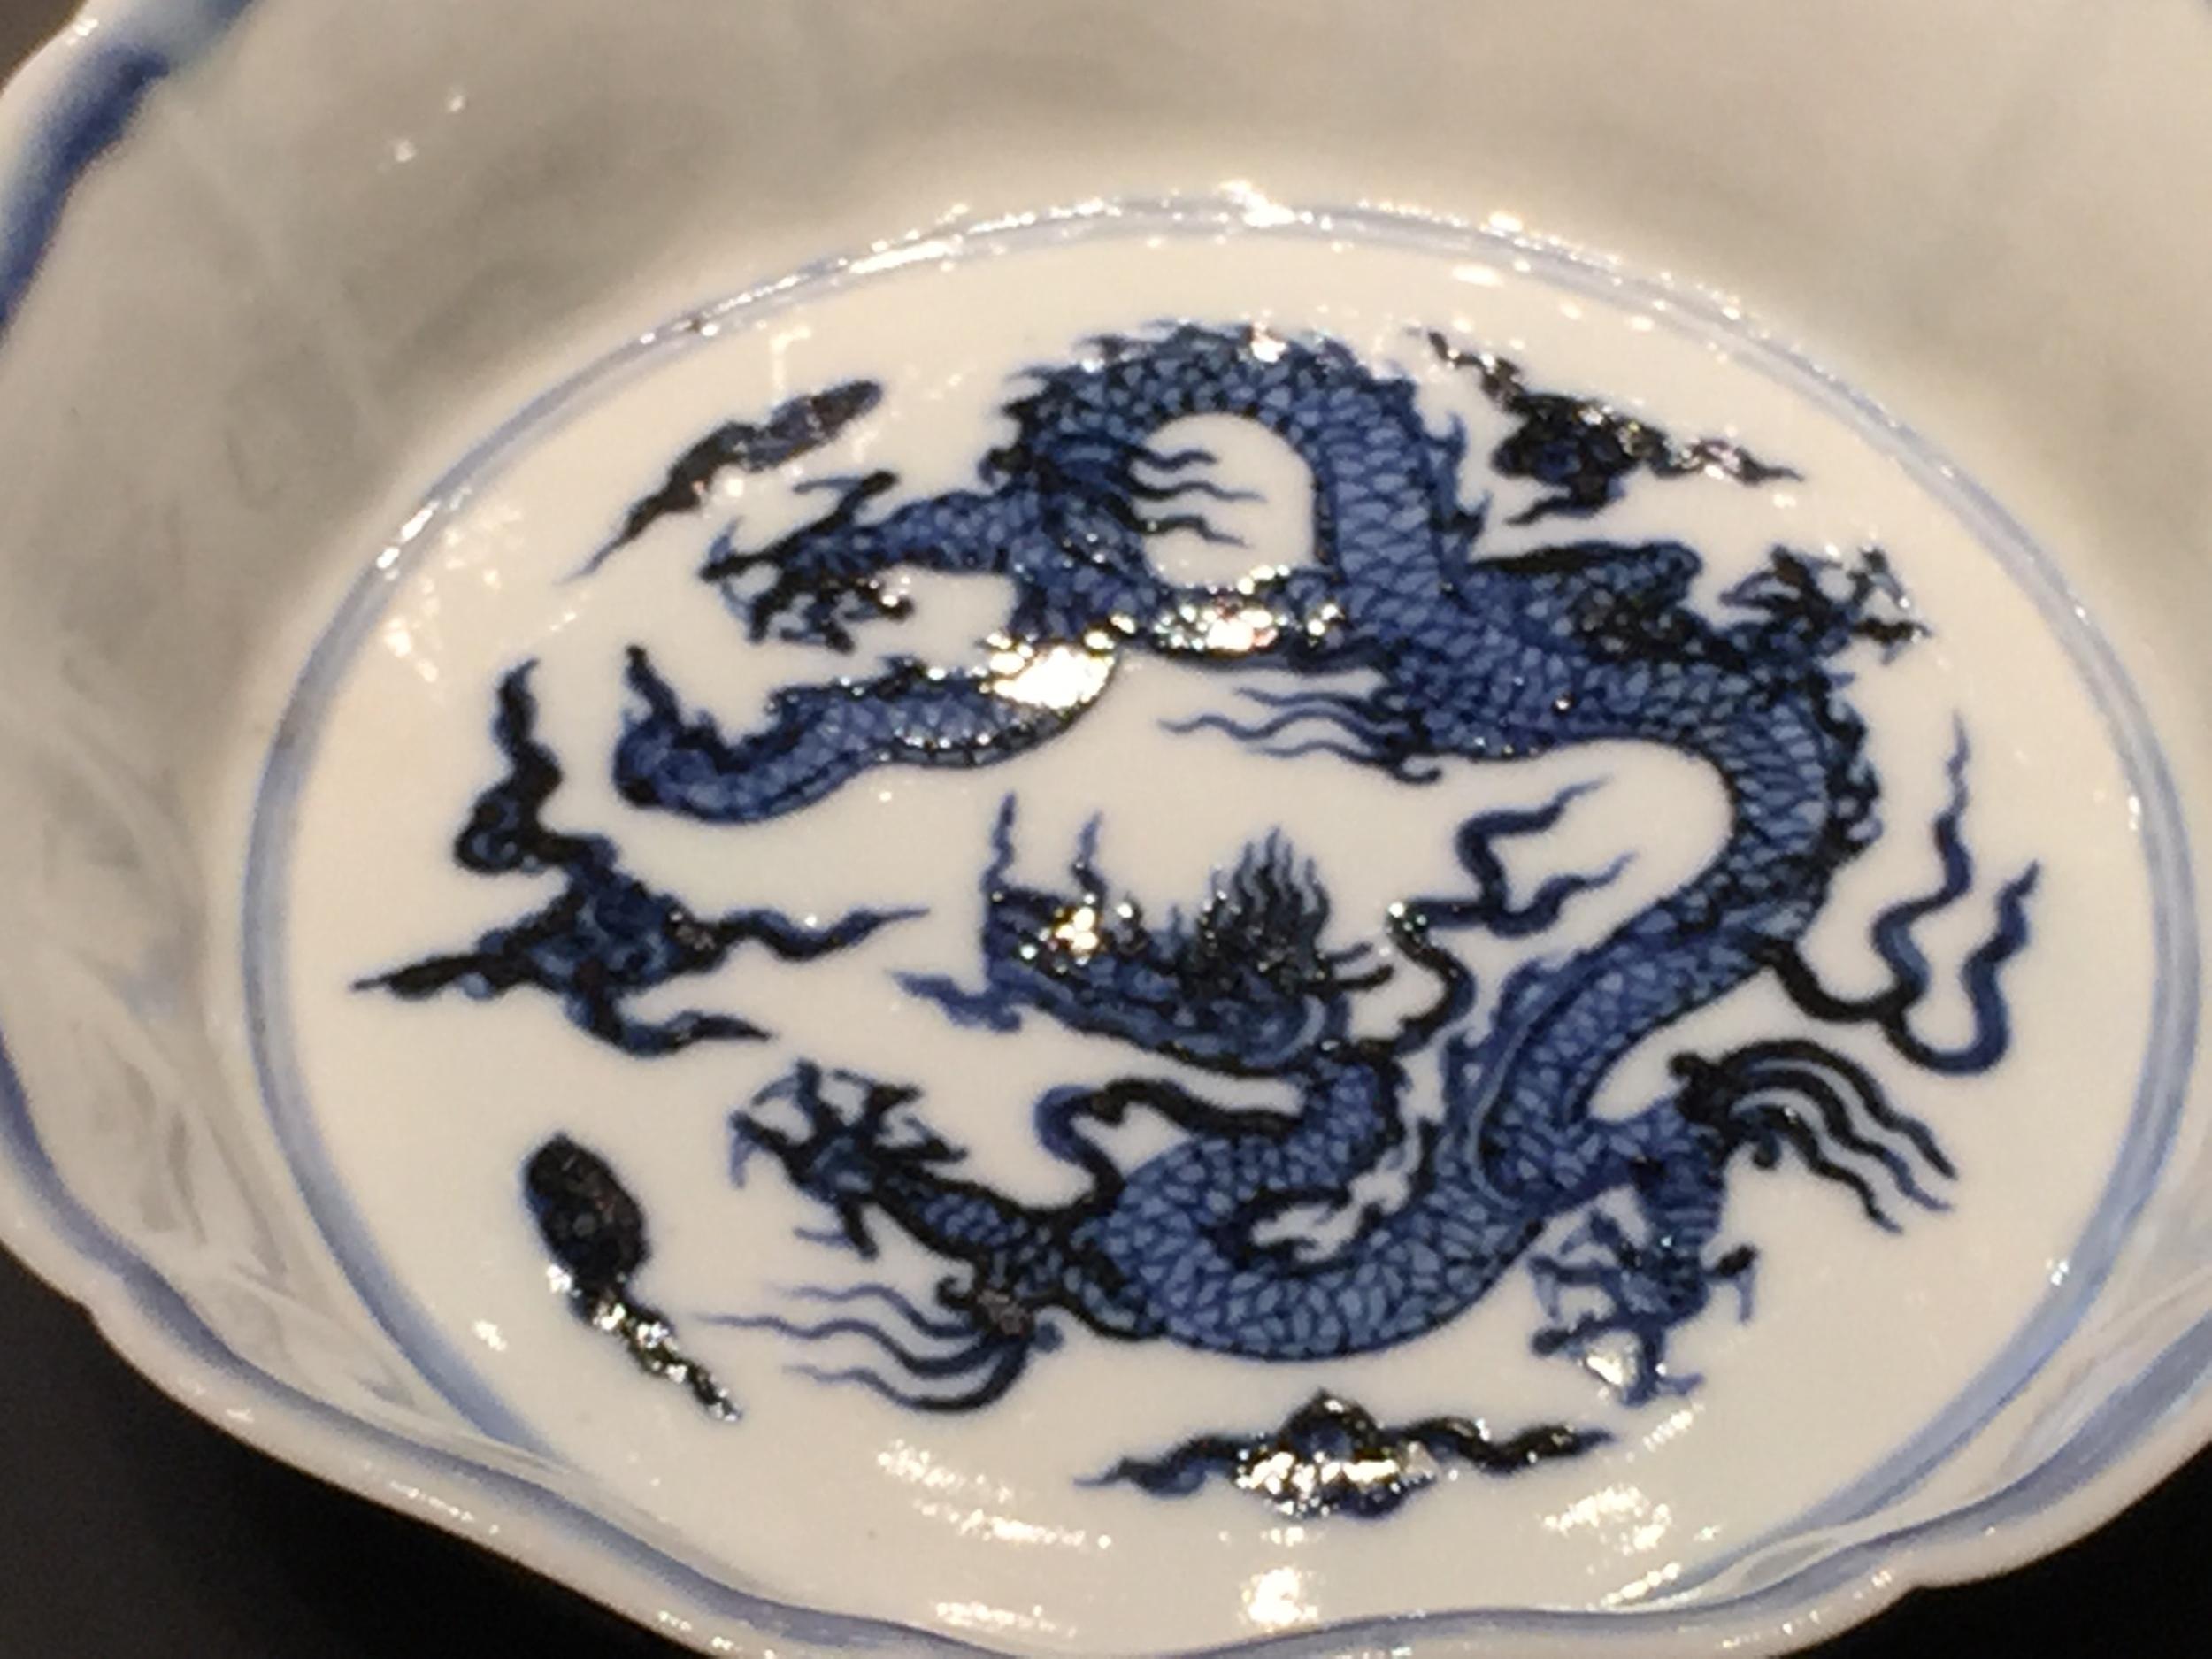 Chinese-Porcelain-British-Museum-Percival-David-jessewaugh.com-58.jpg